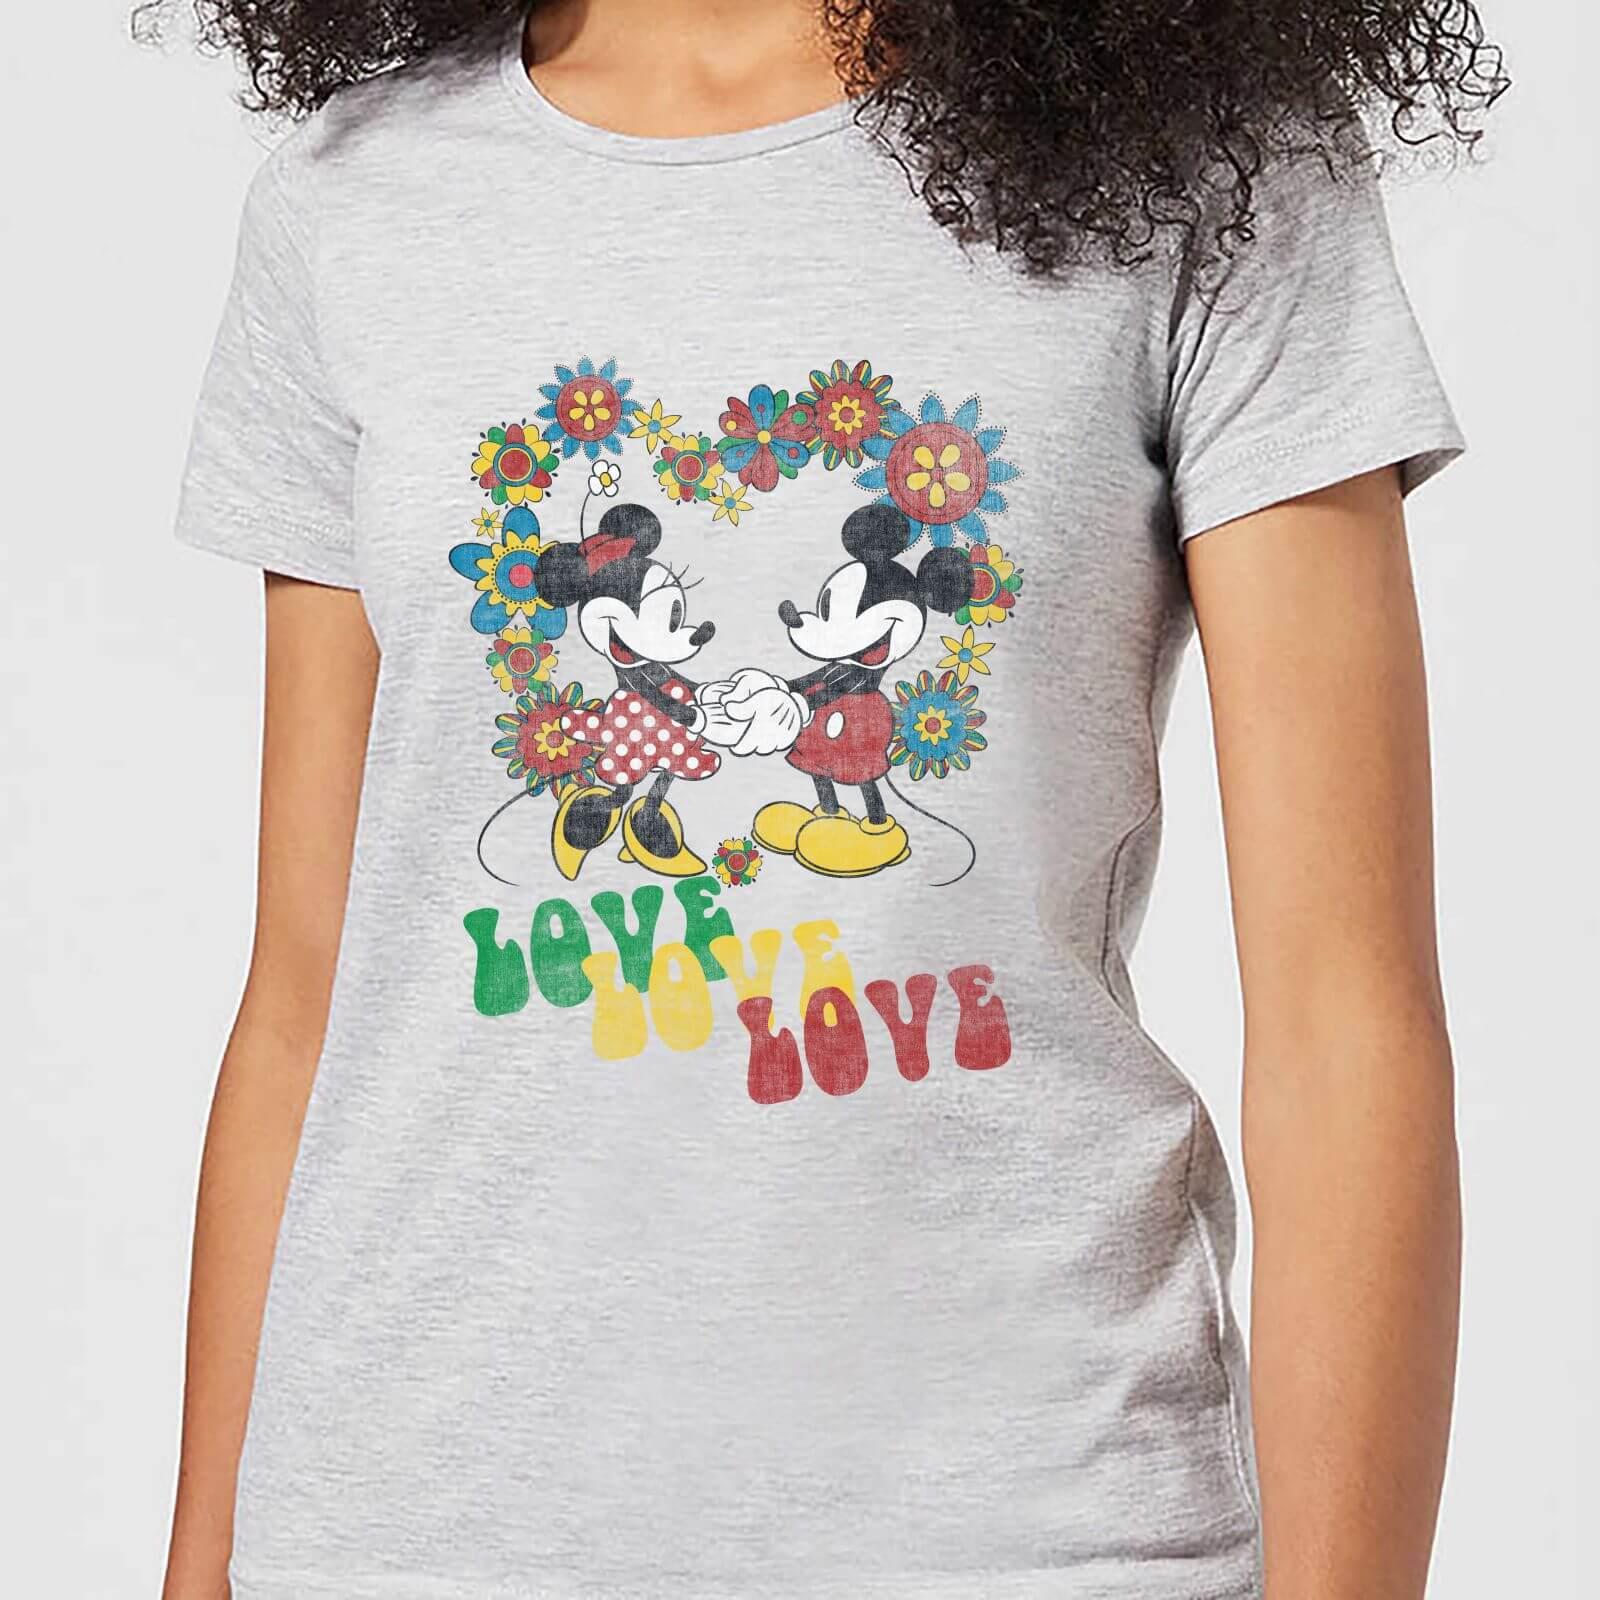 Disney Mickey Mouse Hippie Love Women's T-Shirt - Grey - 3XL - Grey